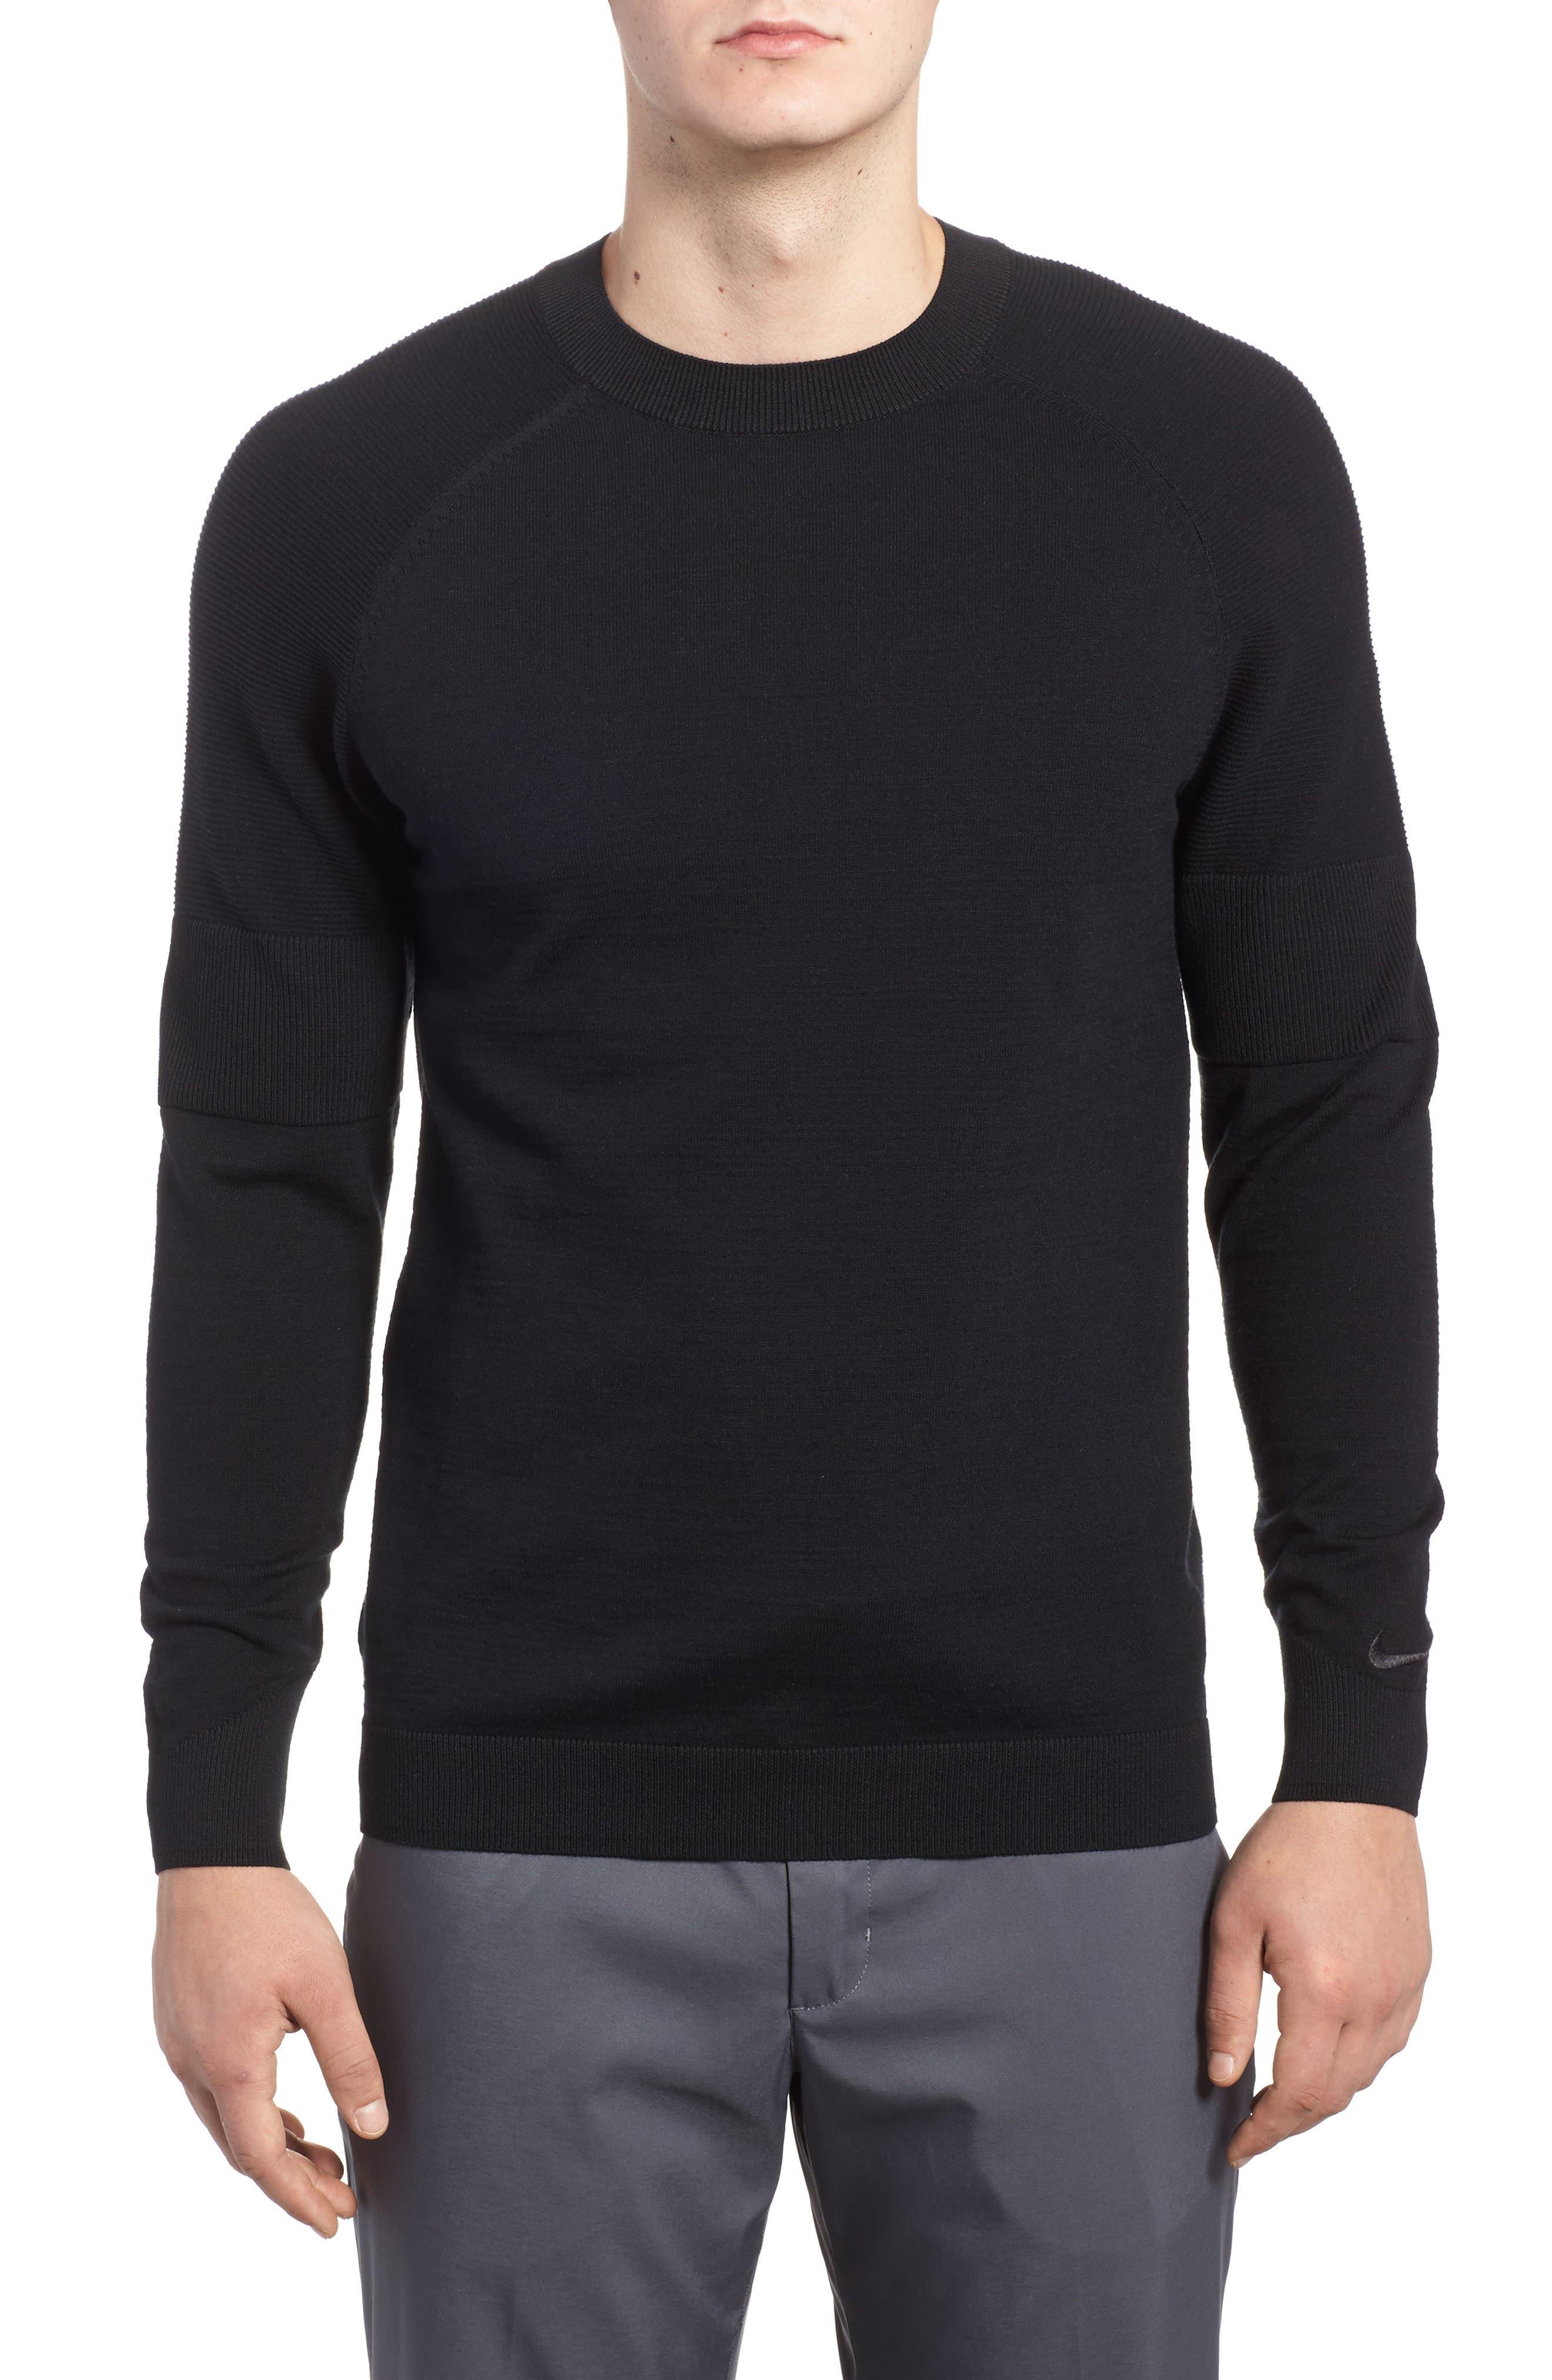 Main Image - Nike TW Cotton Blend Sweatshirt